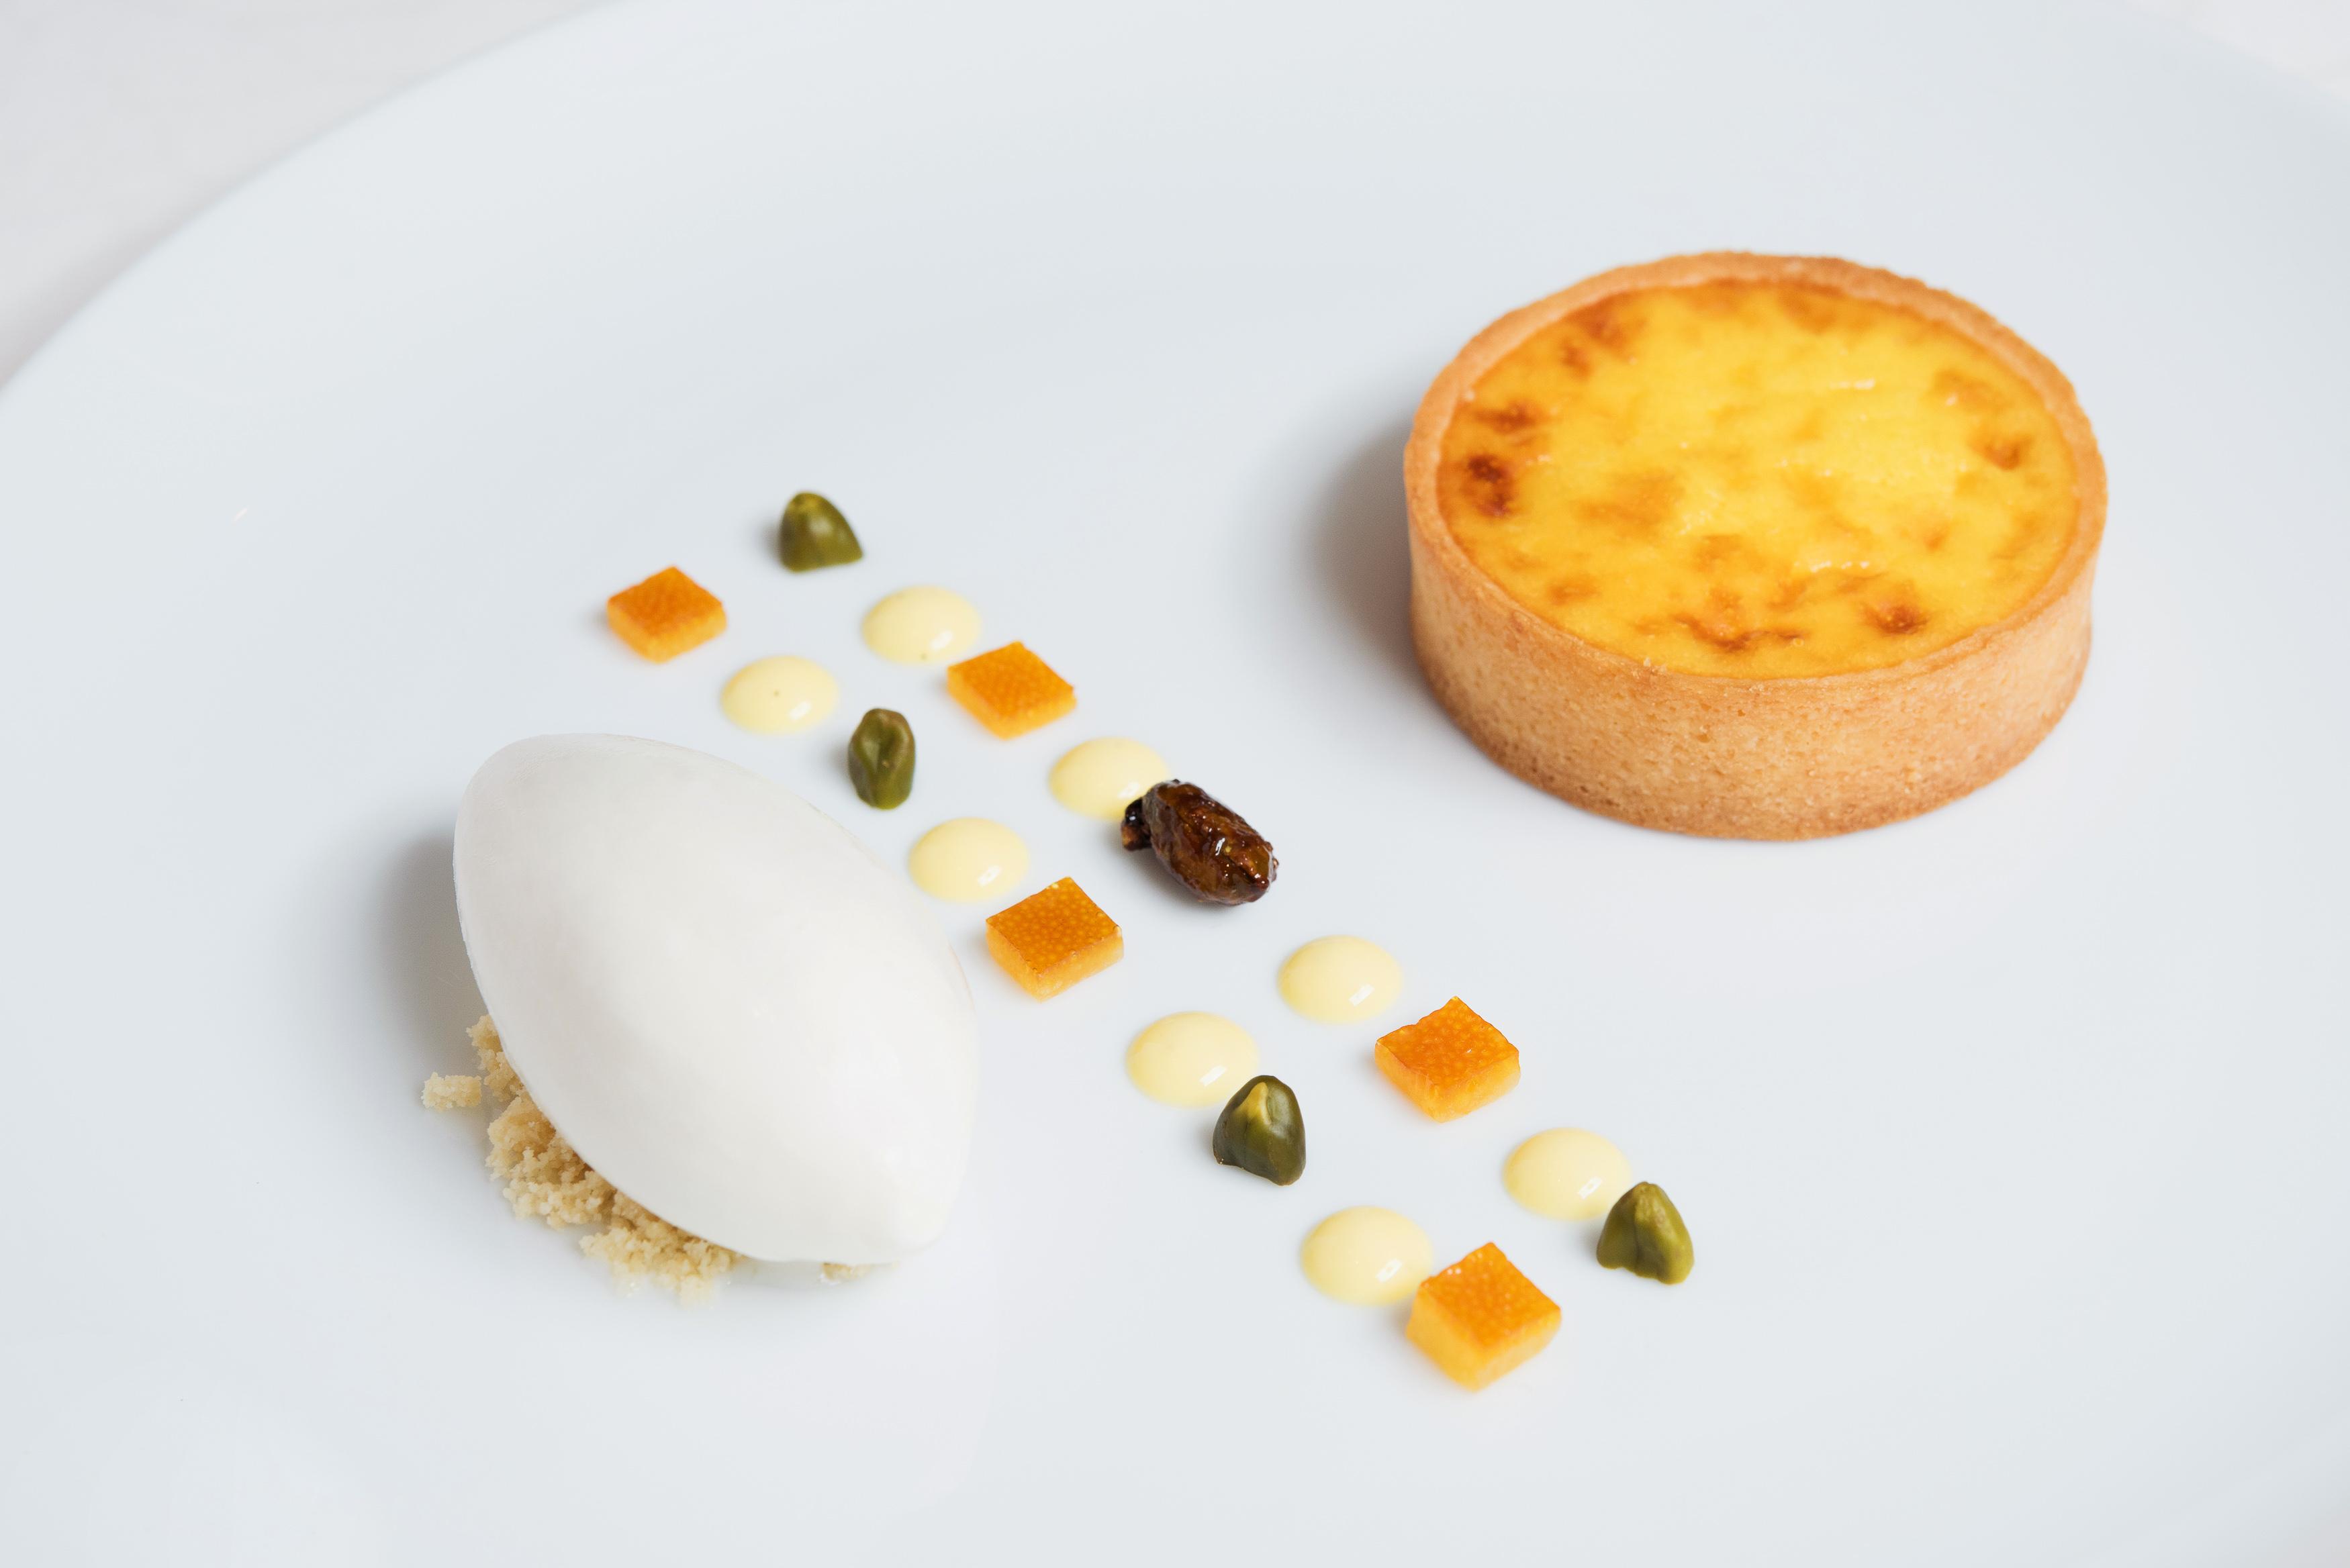 Classic Warm Ricotta Tart, pistachio, candied orange and ricotta gelato